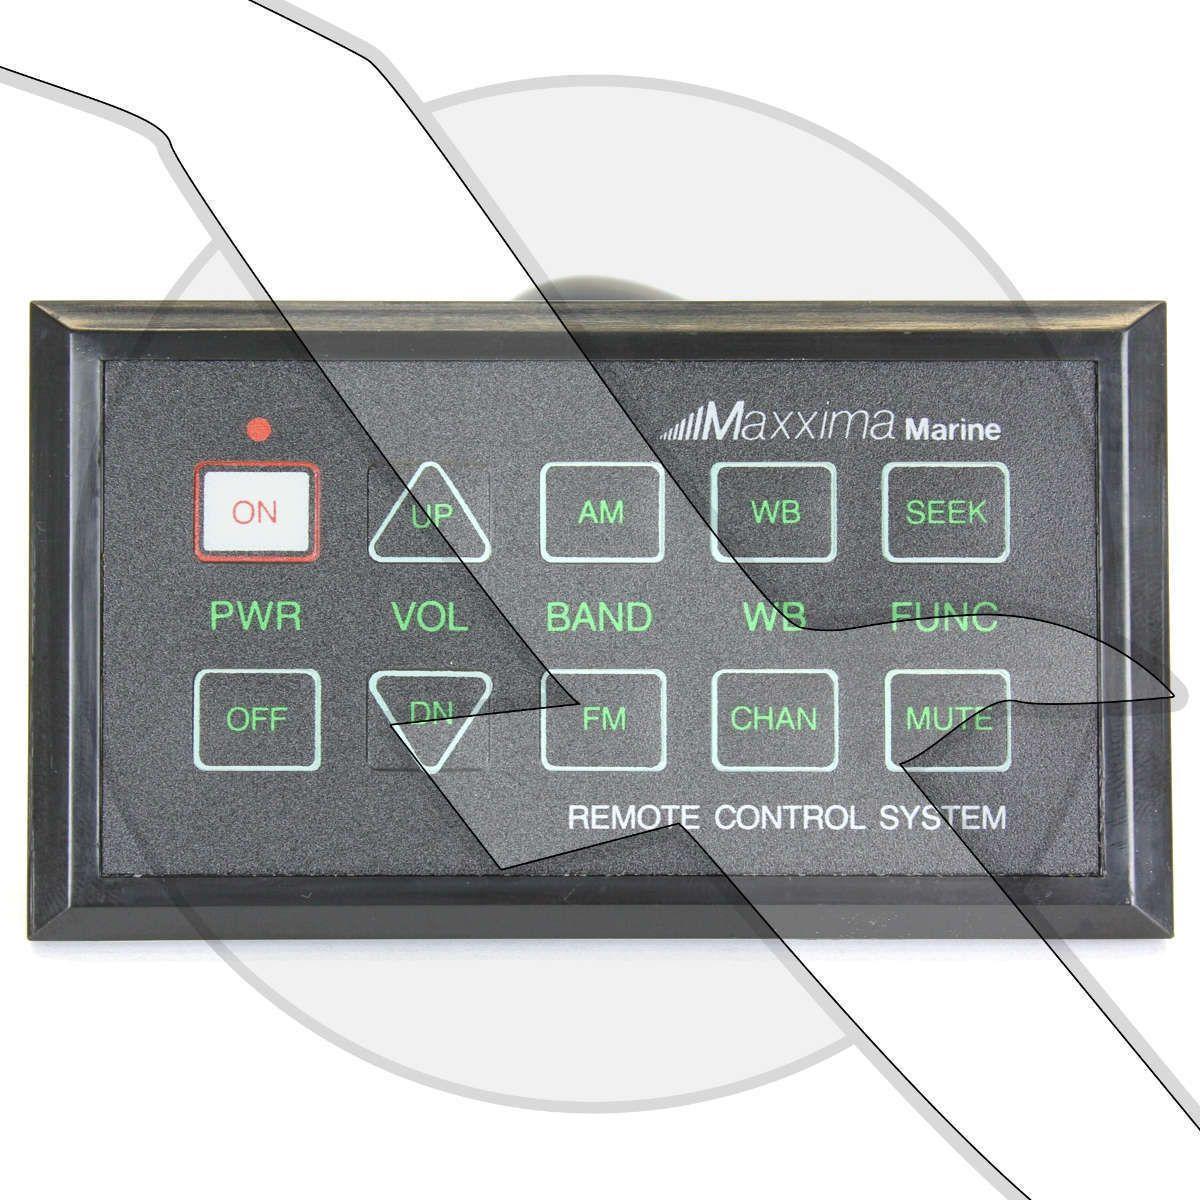 Maxxima Marine Stereo Wiring Diagram Electrical Diagrams Jbl Boat